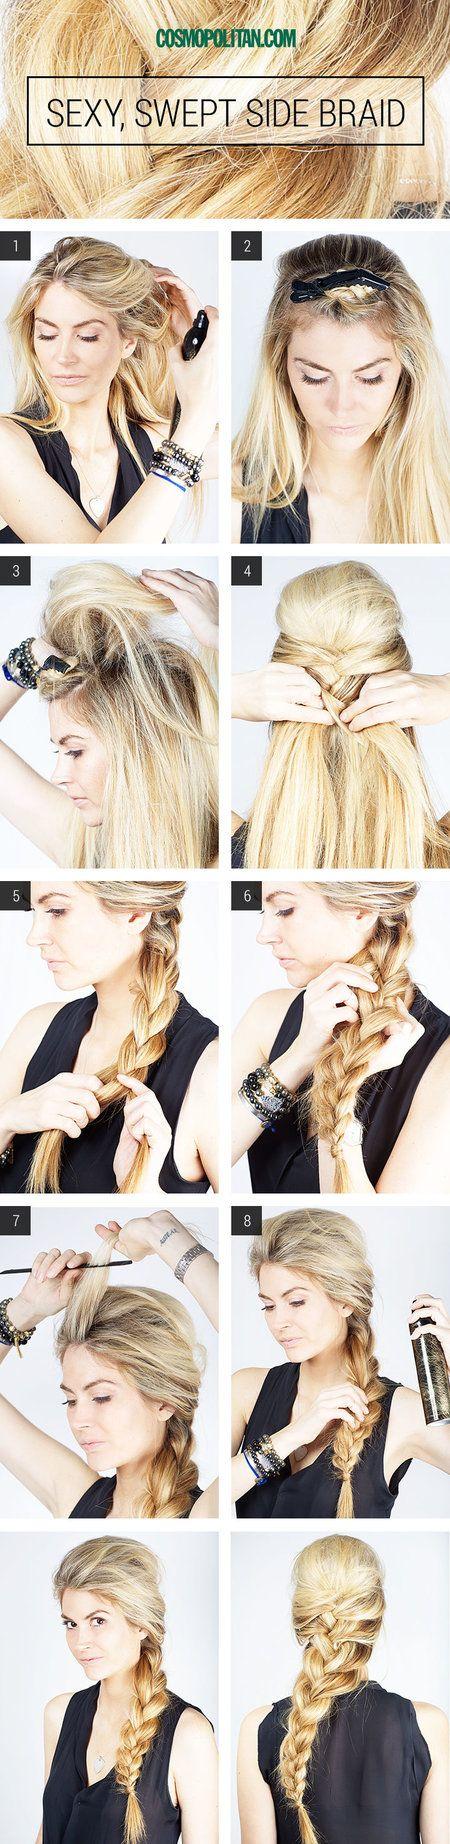 Side braid tutorial pins rockersunshinehow